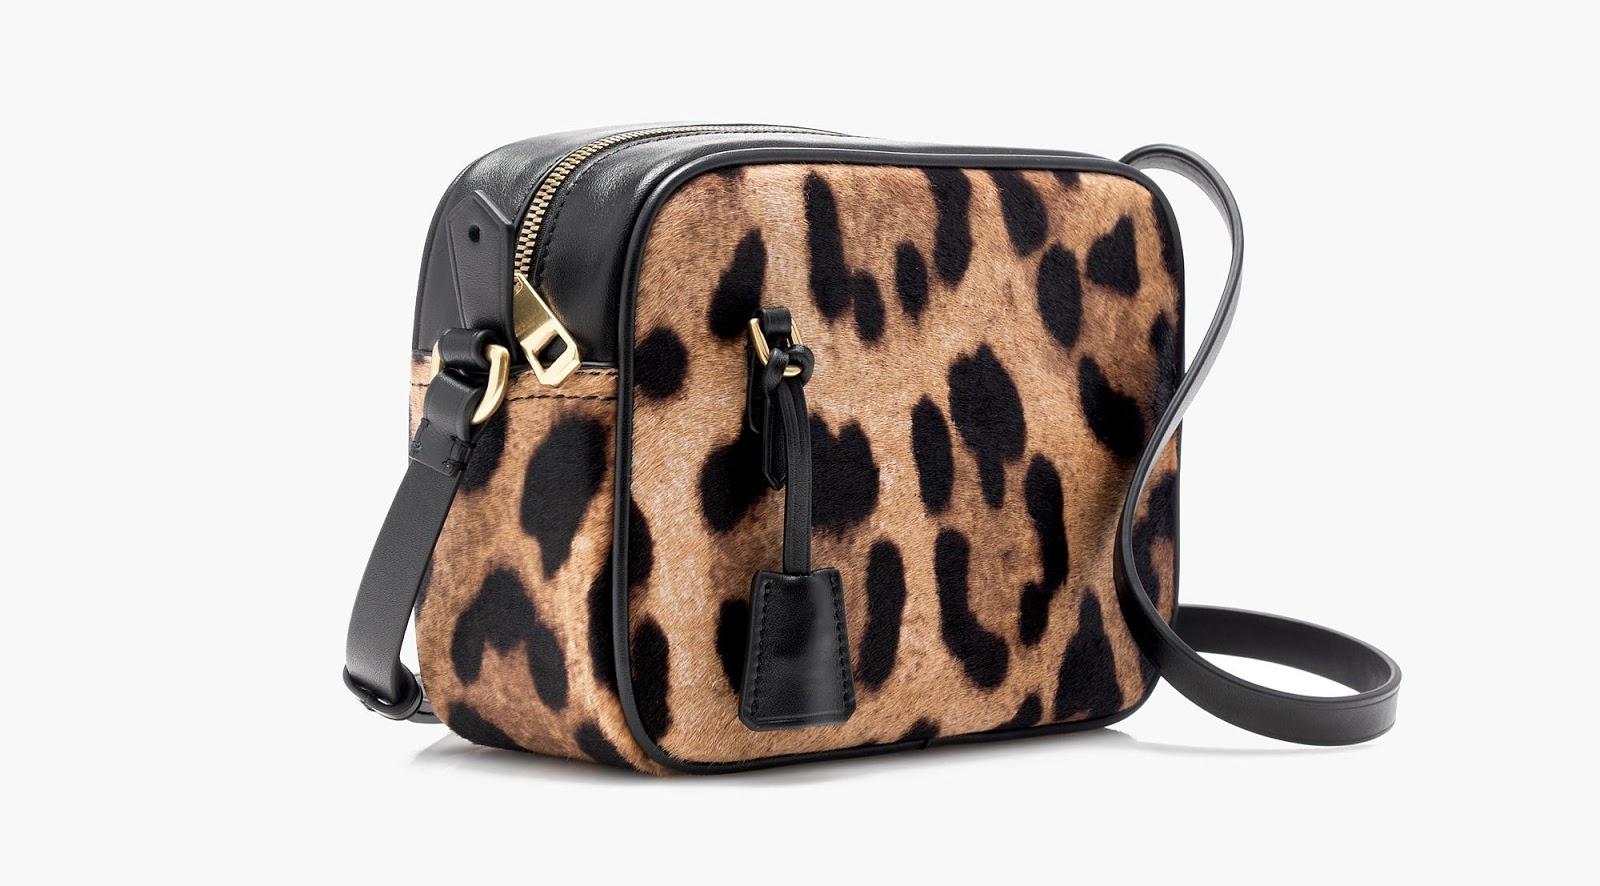 J.Crew Signet Bag Best Bags for Fall Winter 2016